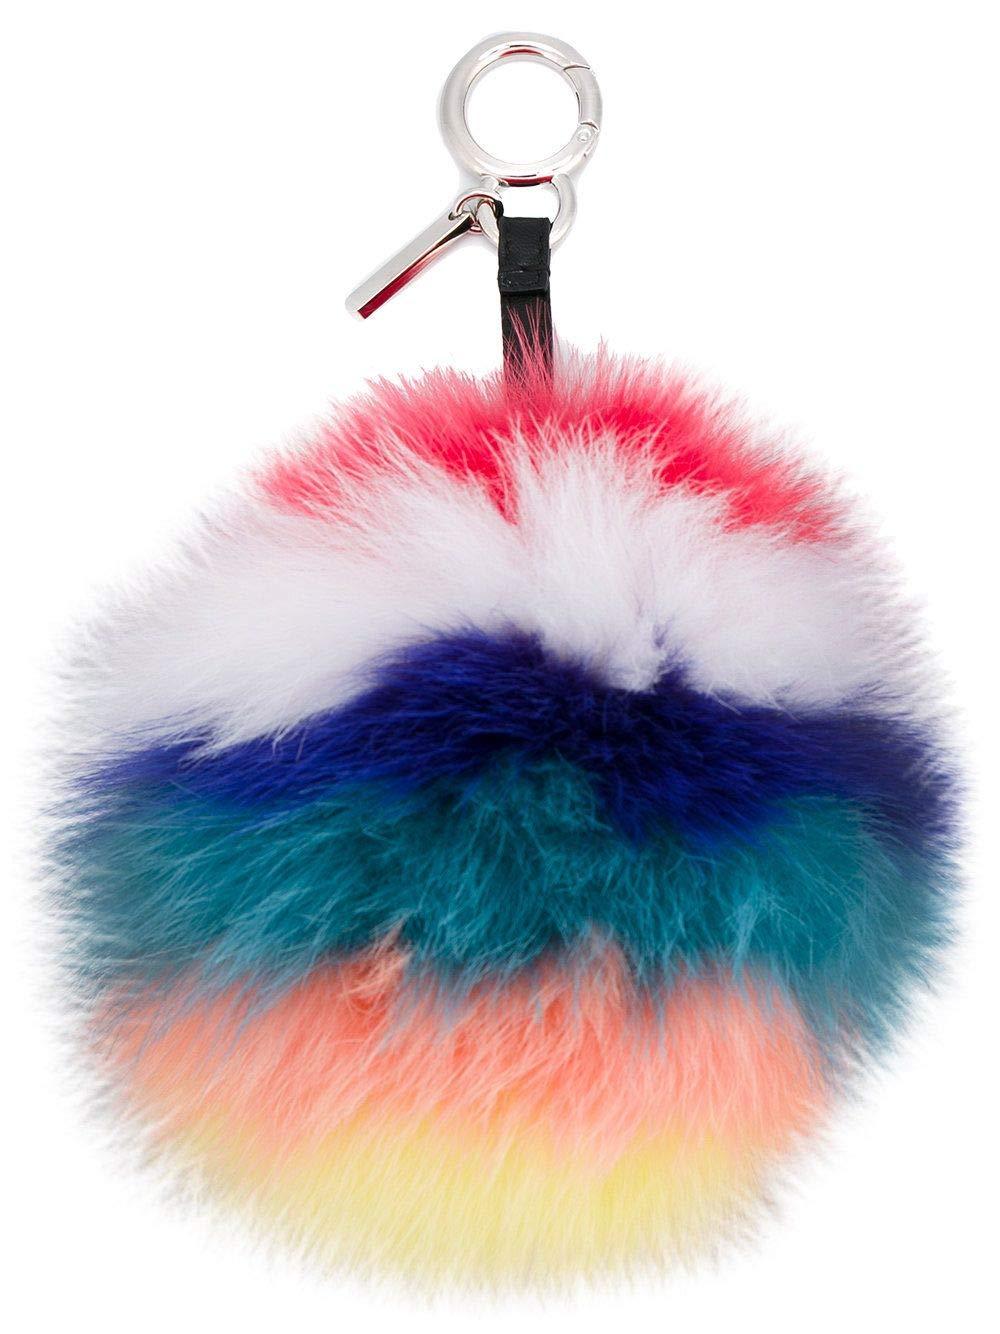 Fendi Women's 7Ar259s45f0r9f-Mcf Multicolor Leather Key Chain